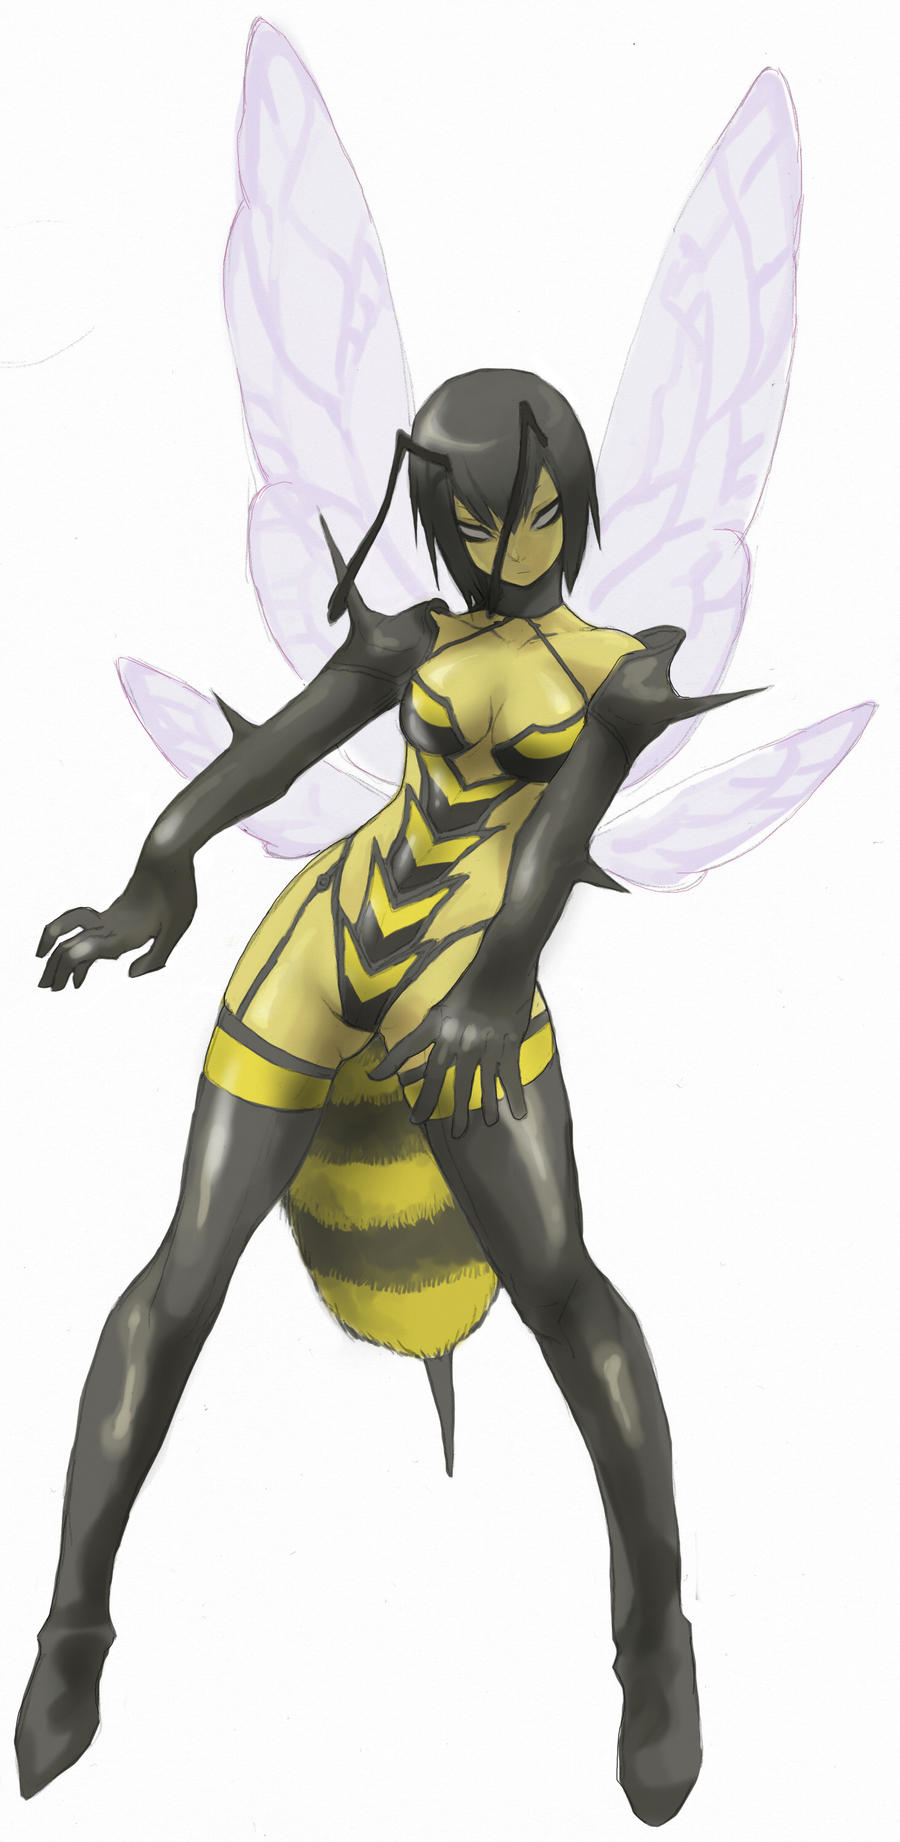 Wasp Girl by HakuryuVision on DeviantArt